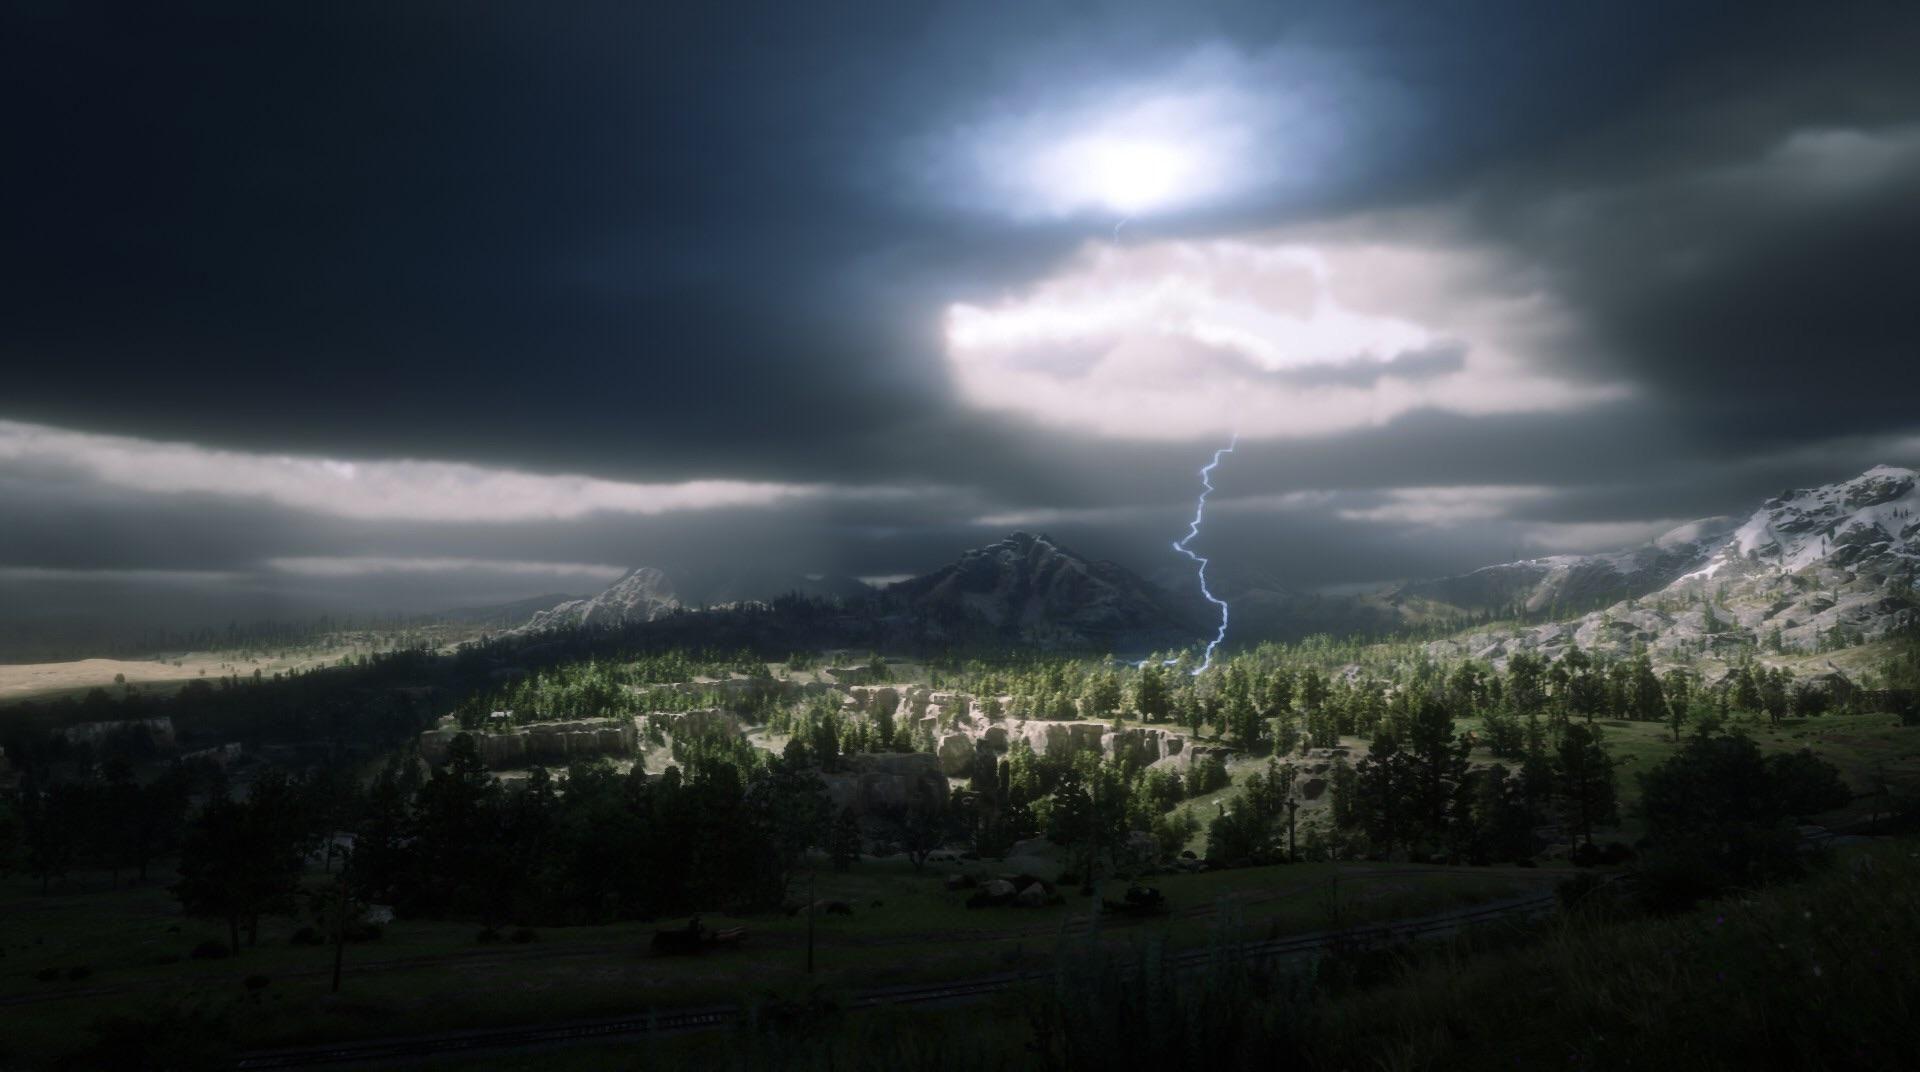 Thunder Struck (Red Dead Redemption 2) [19201072]